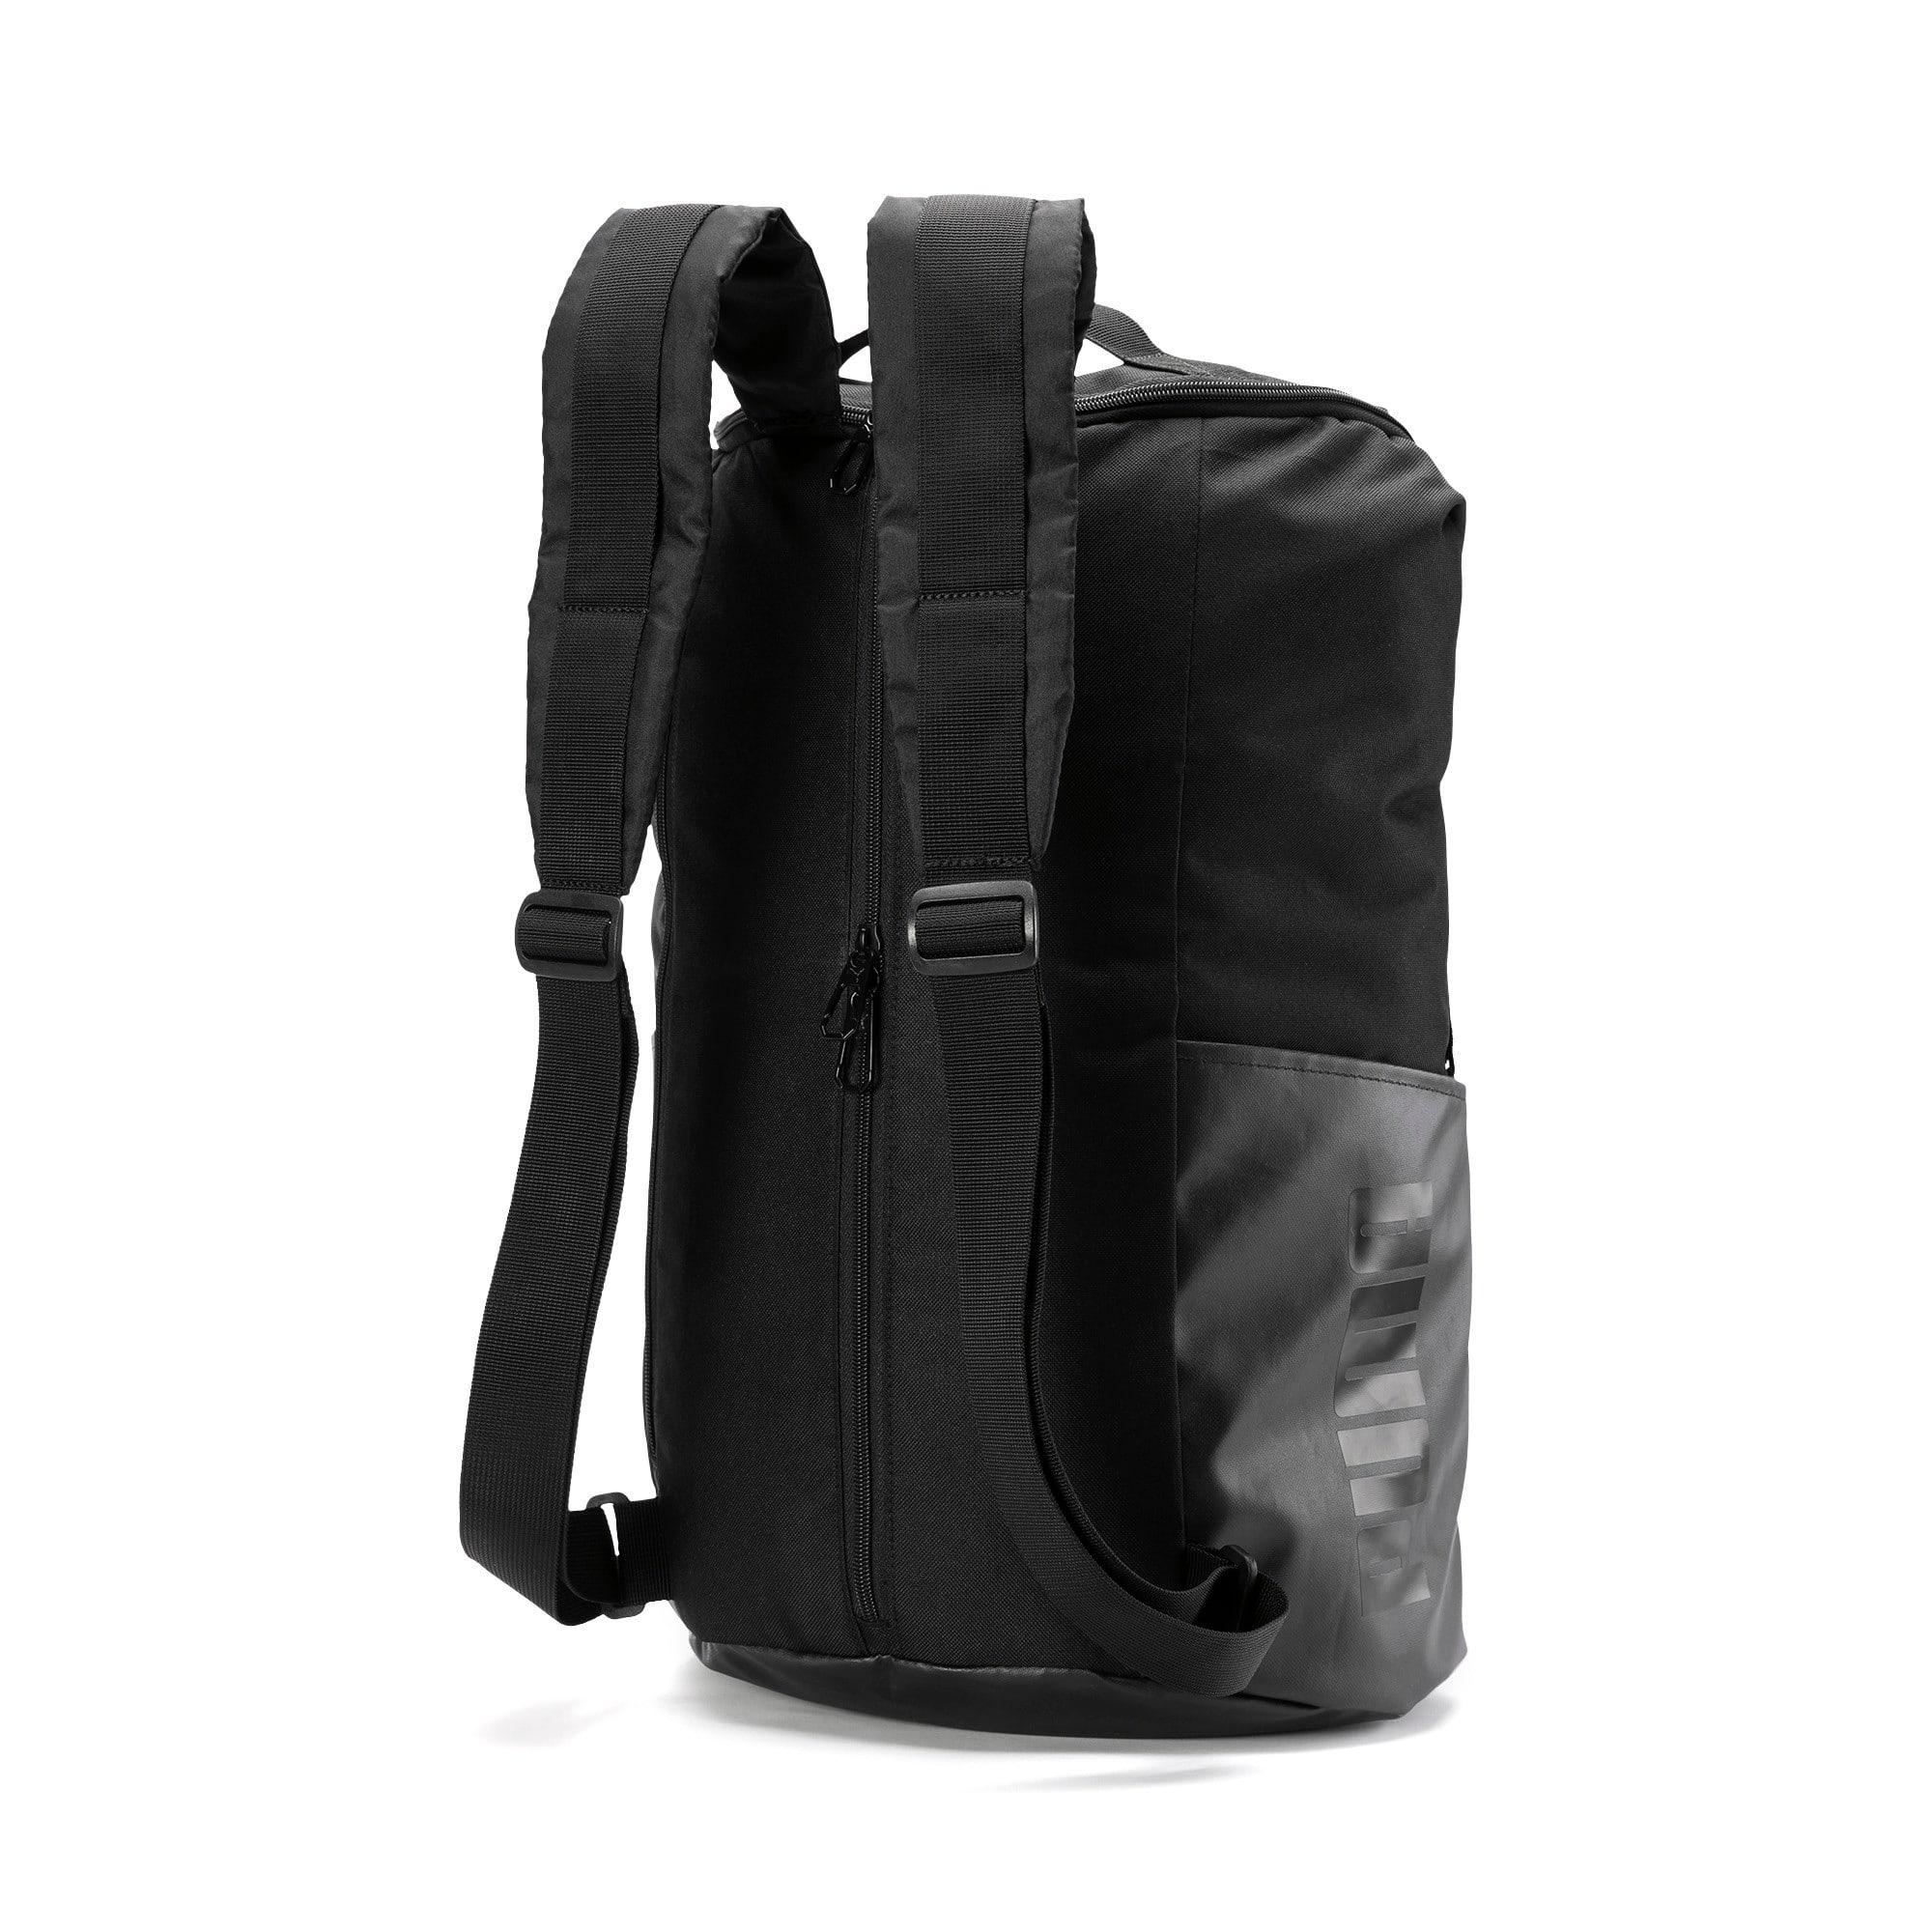 Thumbnail 3 of Training Transform Duffle Bag, Puma Black, medium-IND